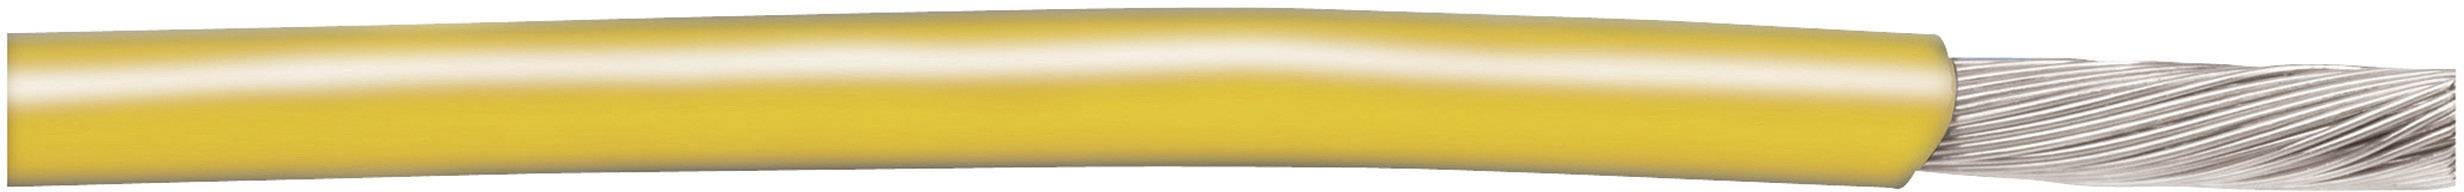 Opletenie / lanko AlphaWire 3075 YL001 1 x 0.82 mm², vonkajší Ø 2.82 mm, metrový tovar, žltá